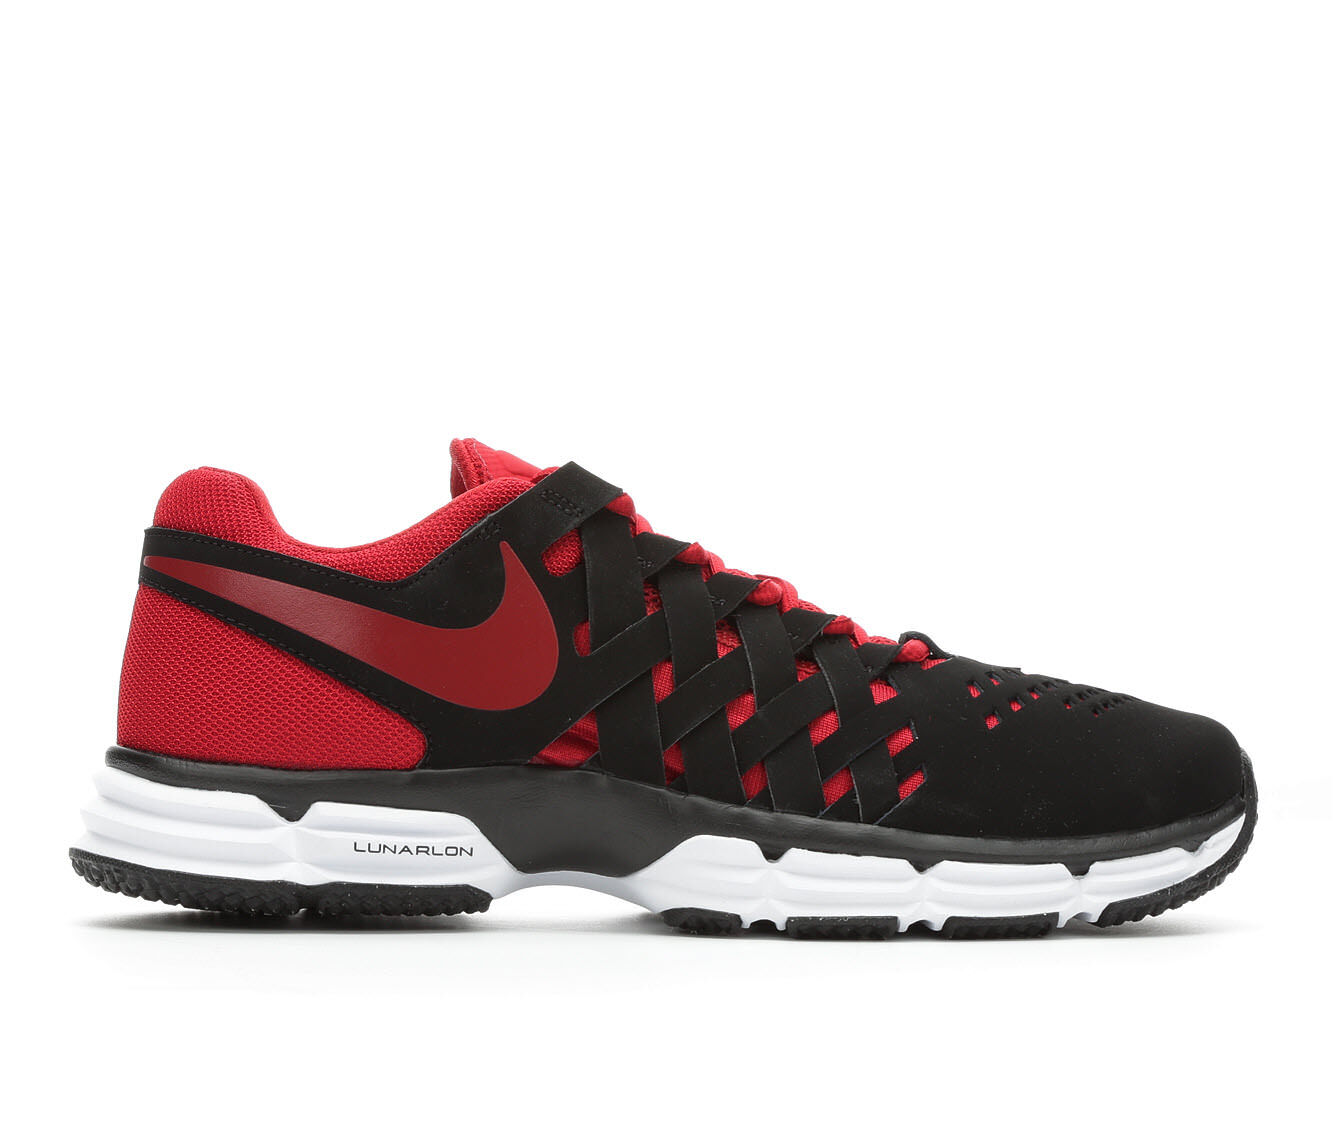 ecdea051fde2 ... canada mens nike lunar fingertrap training shoes shoe carnival 72226  e39d0